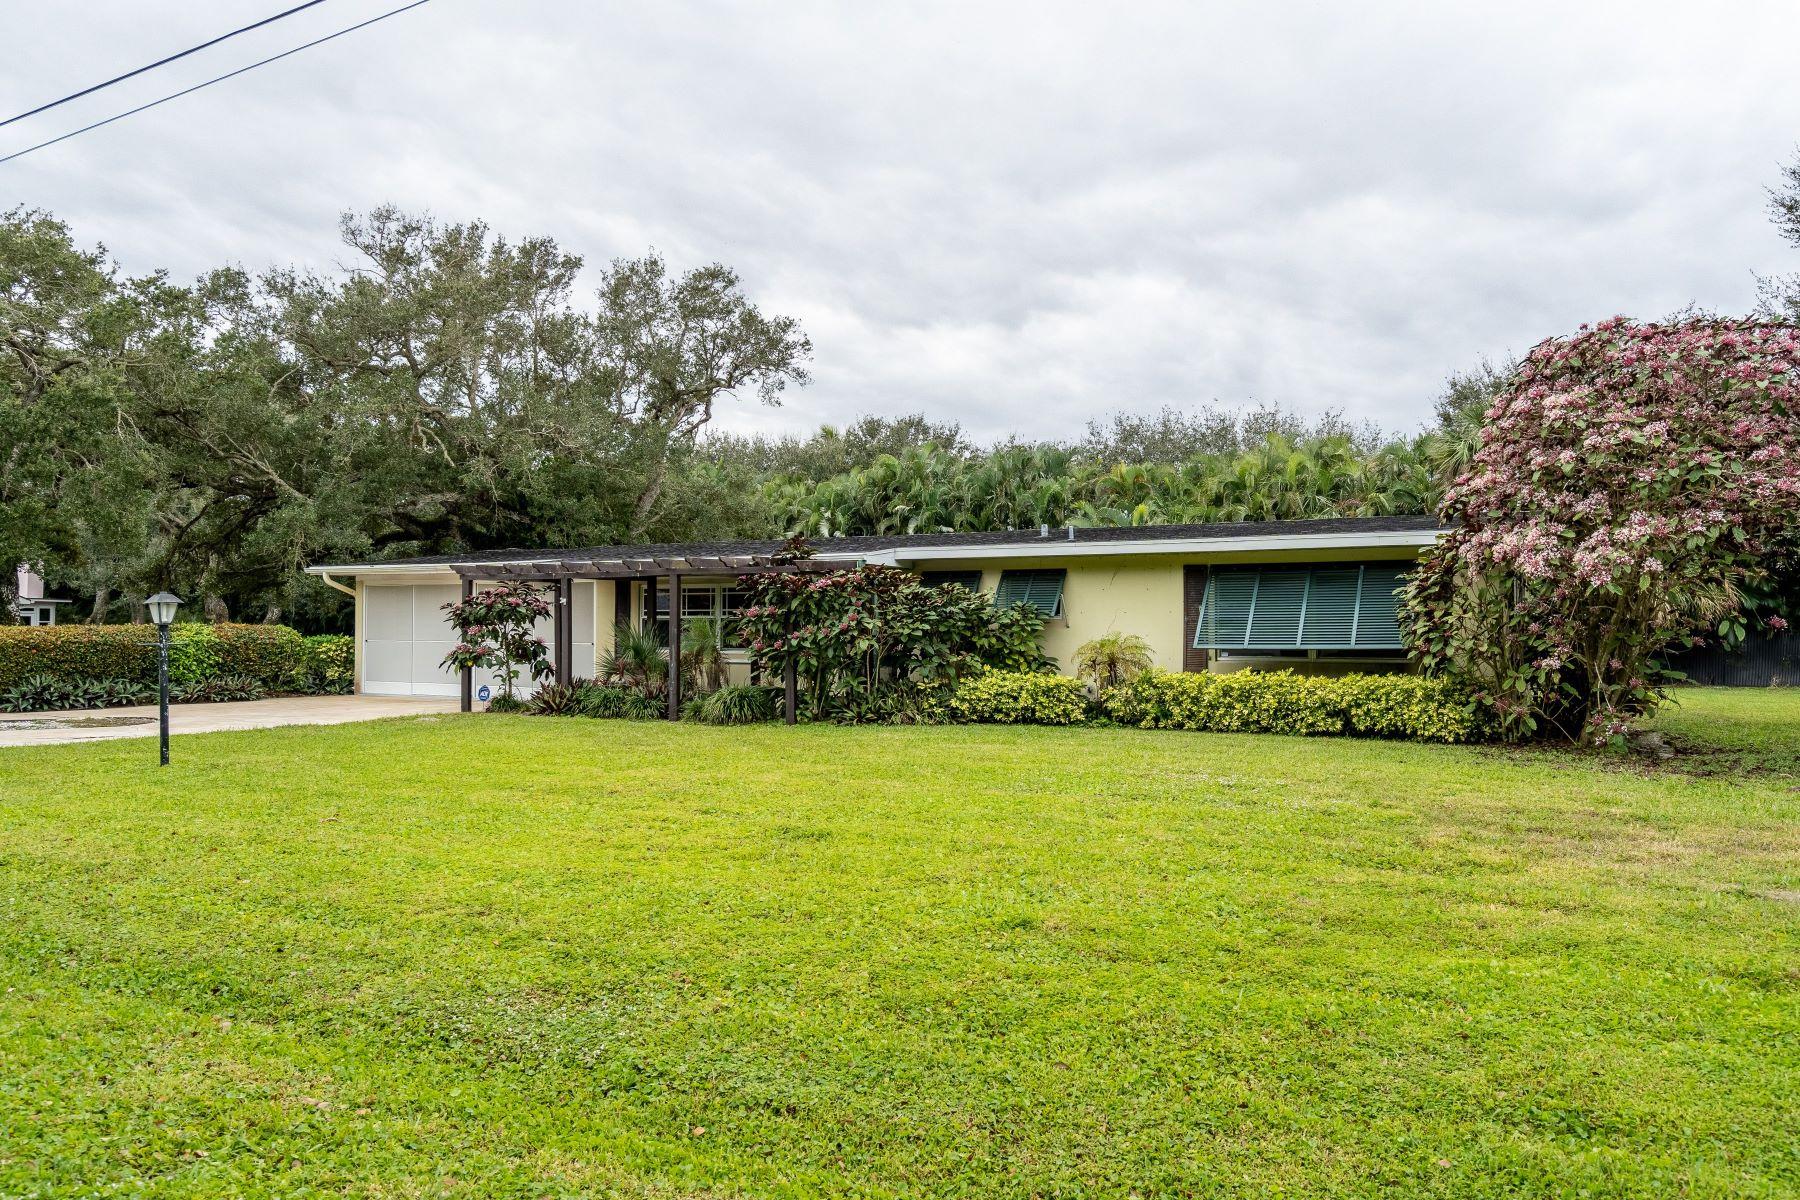 9505 Frangipani Drive 9505 Frangipani Drive Vero Beach, Floride 32963 États-Unis